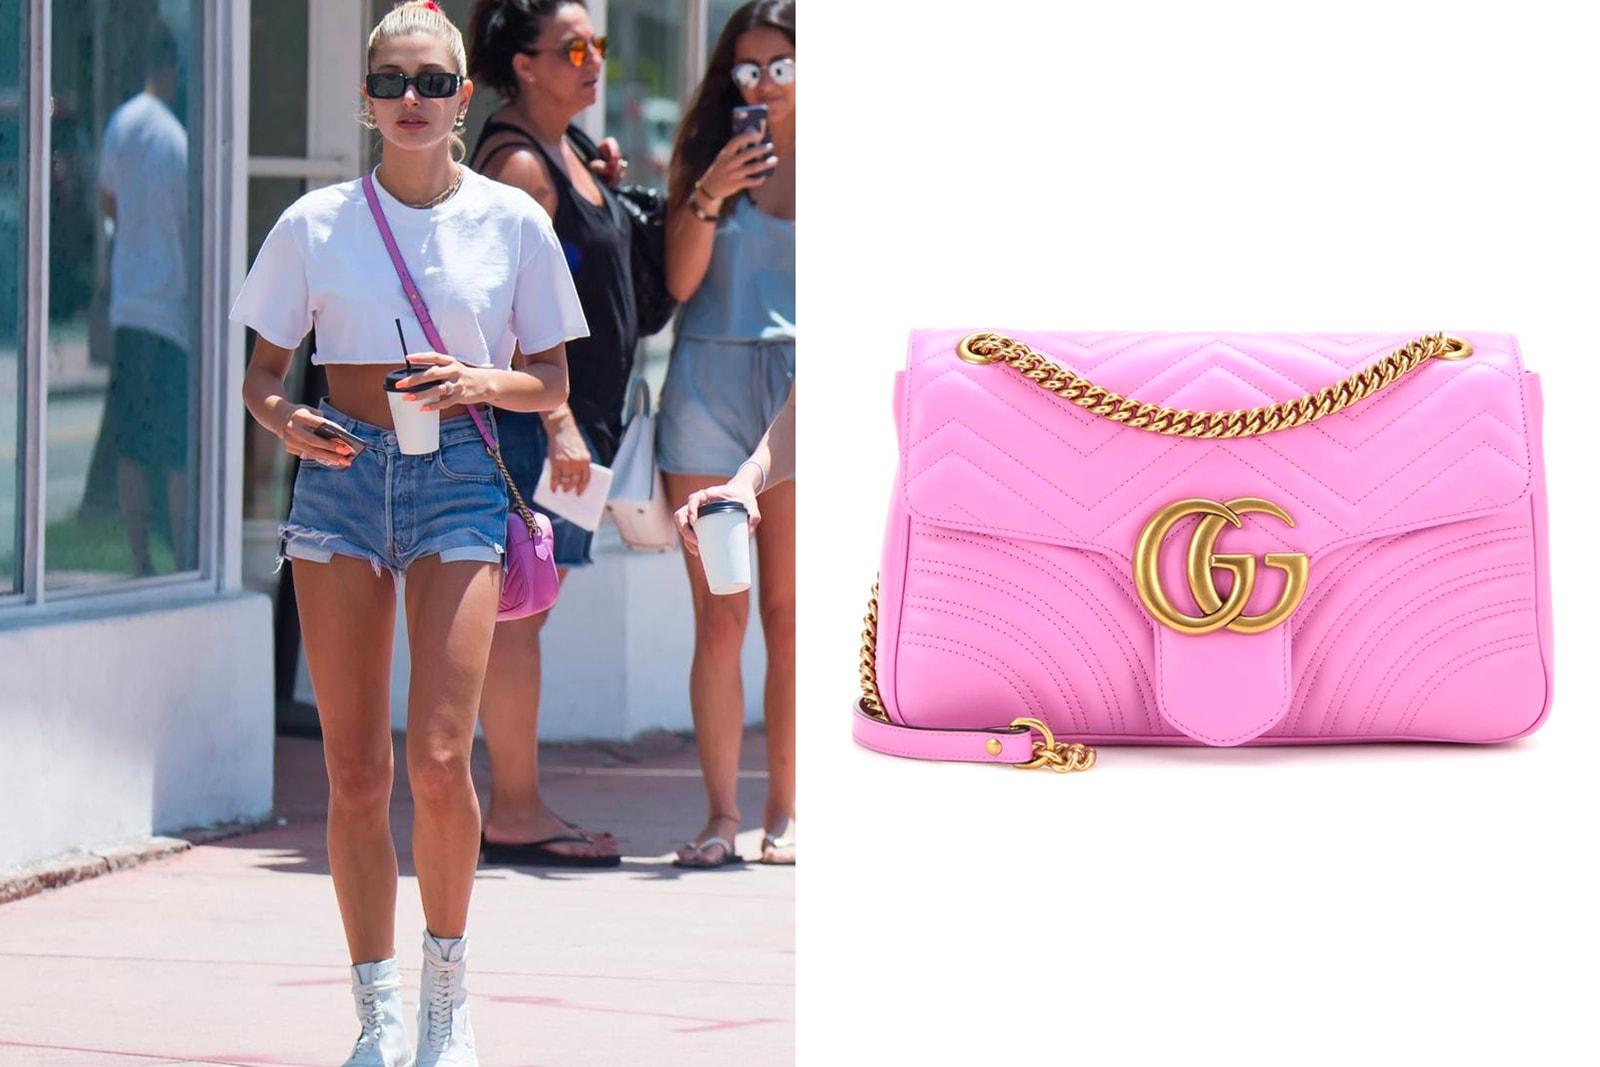 Celebrities Favorite Designer Bags Handbags Spring 2018 Rihanna Balenciaga Hailey Baldwin Gucci Kylie Jenner Proenza Schouler Kendall Jacquemus Bella Hadid Prada Irene Kim Loewe